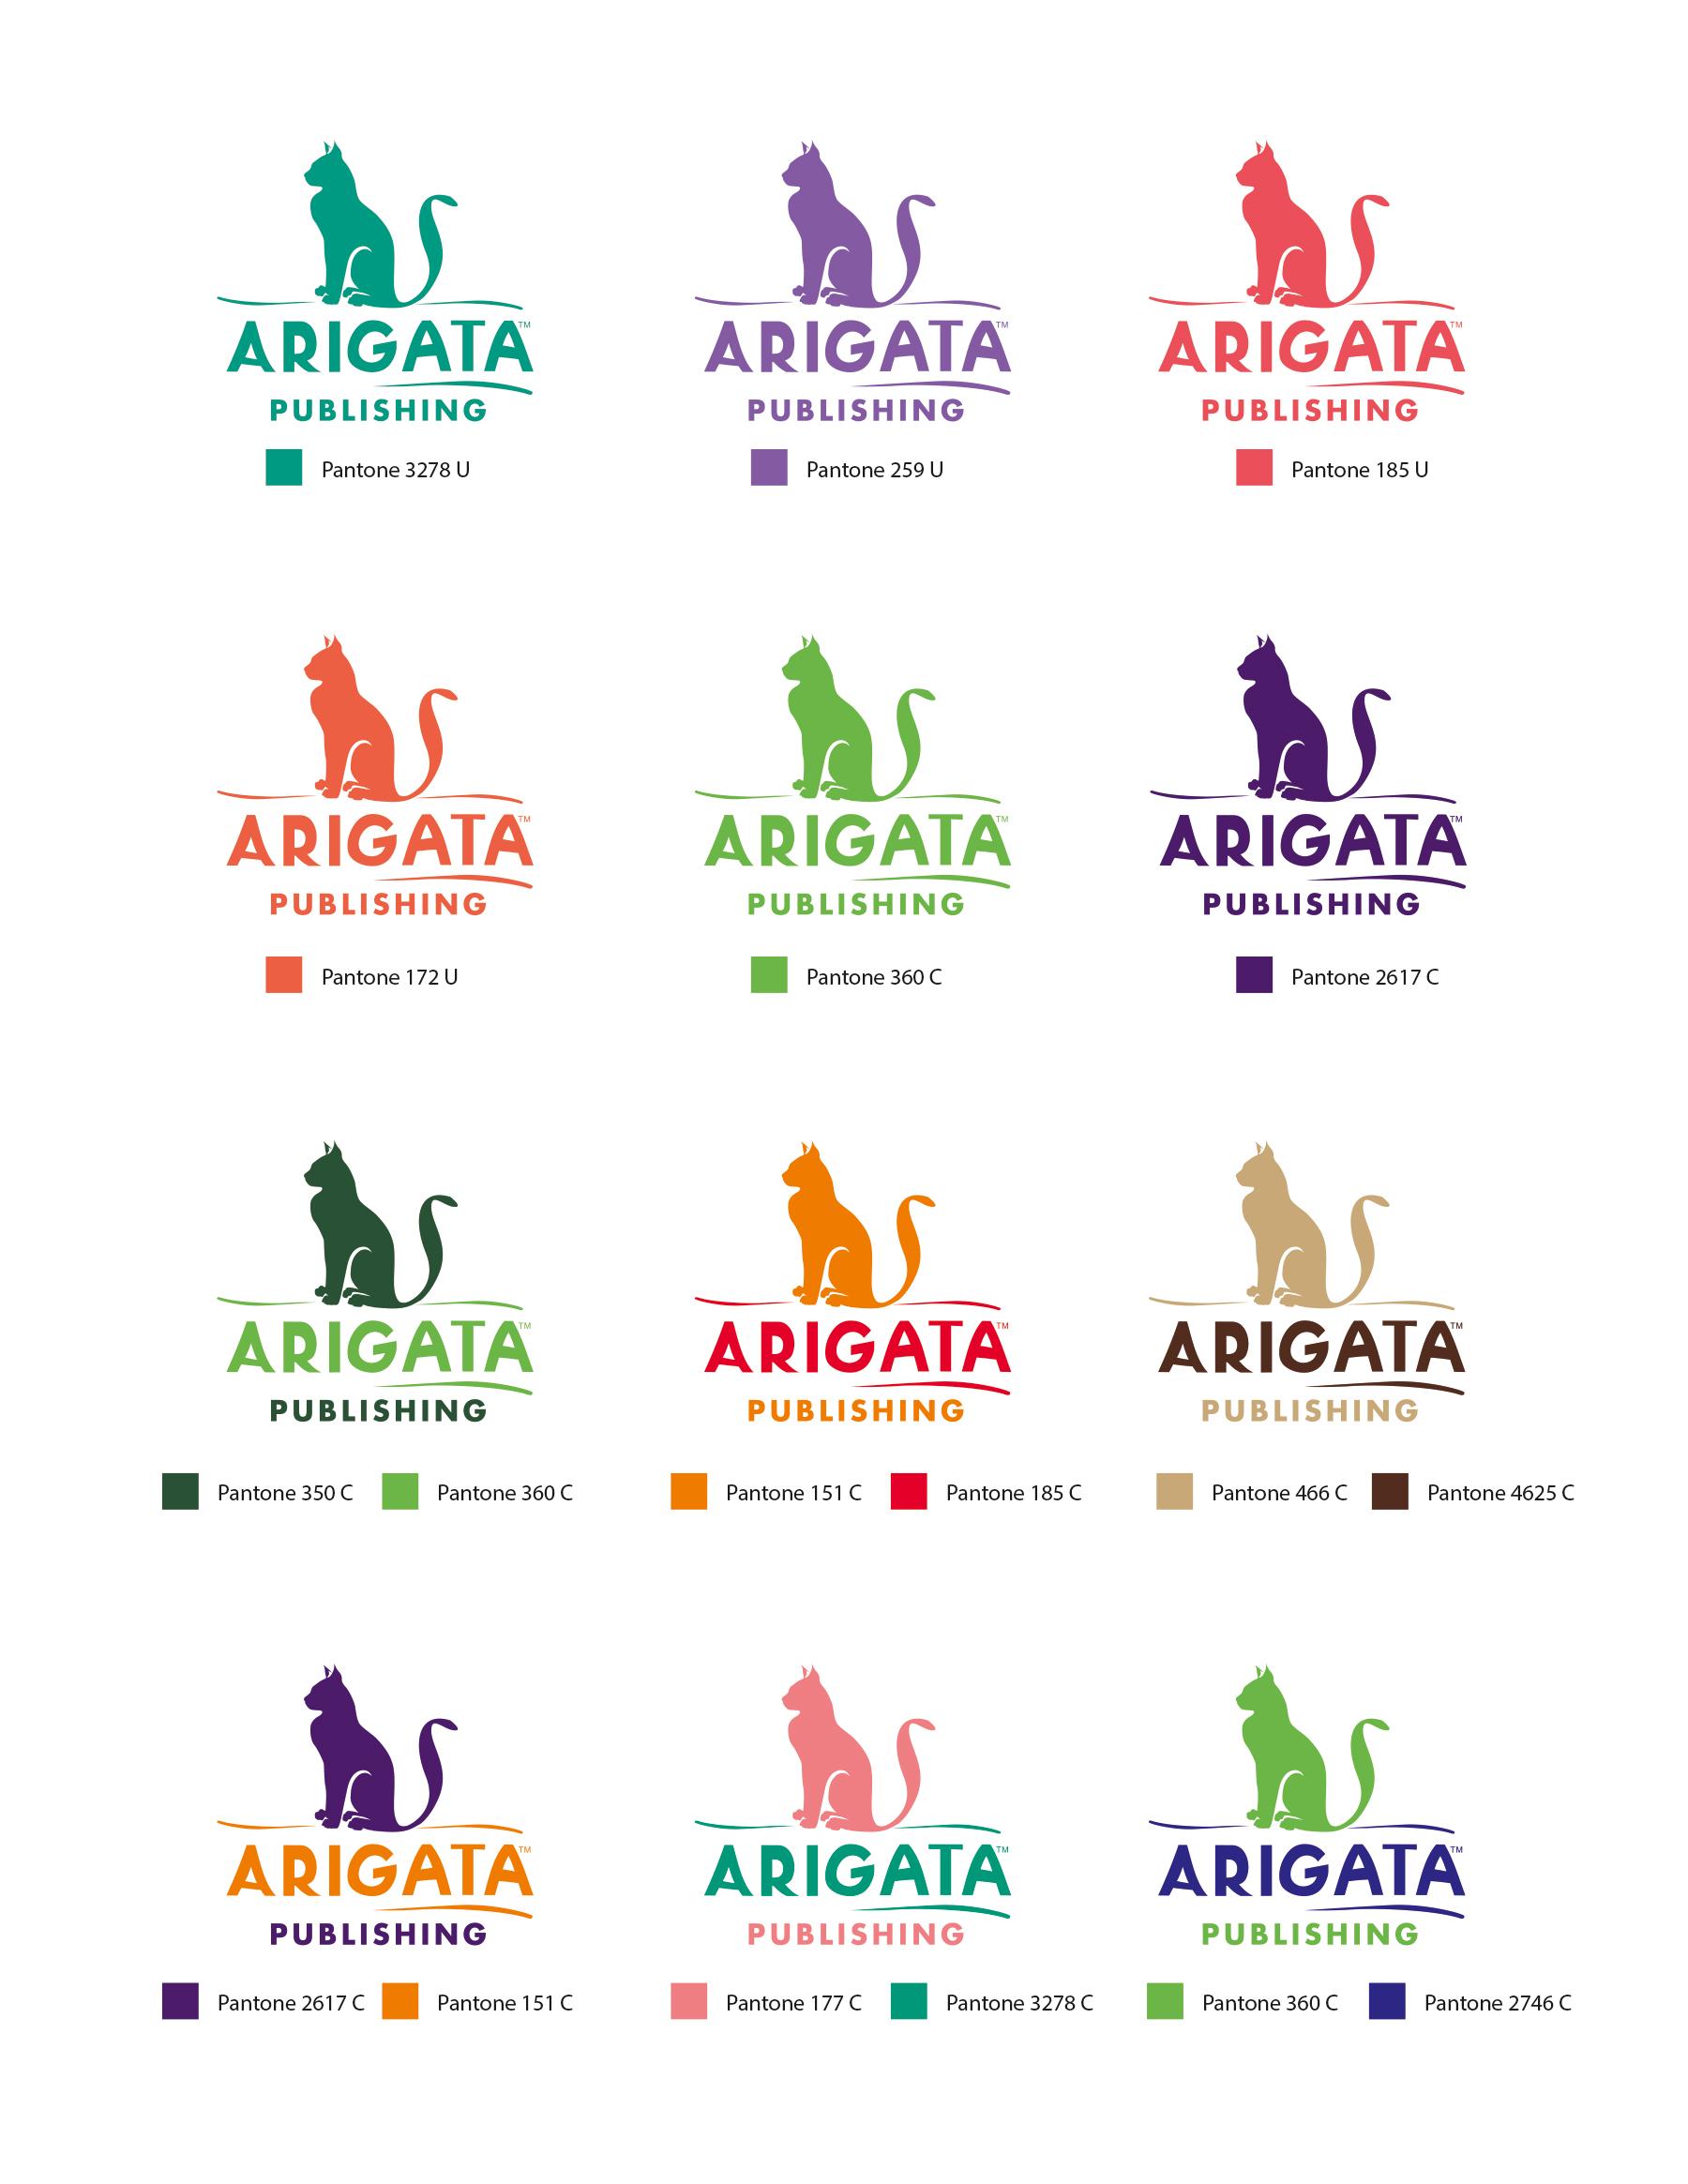 Arigata Publishing – It's Just Me Maria Papaefstathiou